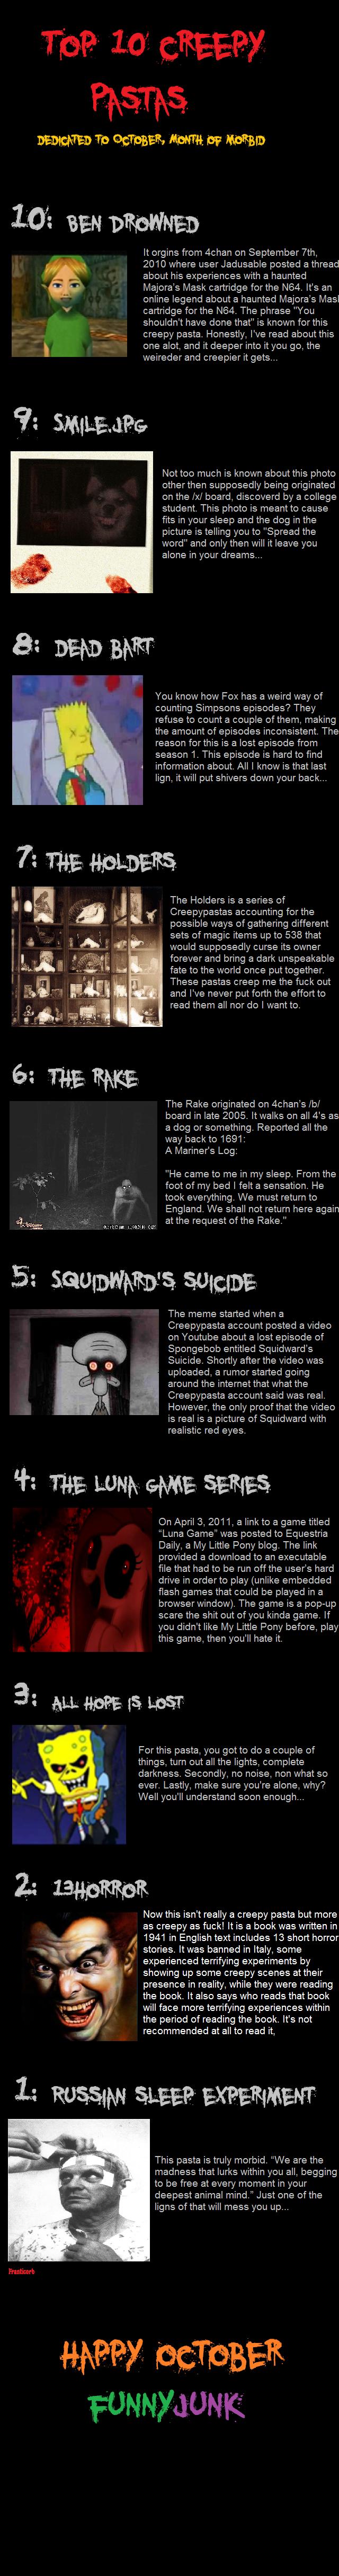 Top 10 Creepy Pasta's. Links knowyourmeme.com/memes/russian-sleep-experiment creepypasta.wikia.com/wiki/Squidward's_Suicide creepypasta.wikia.com/wiki/Hope_is_L October horror